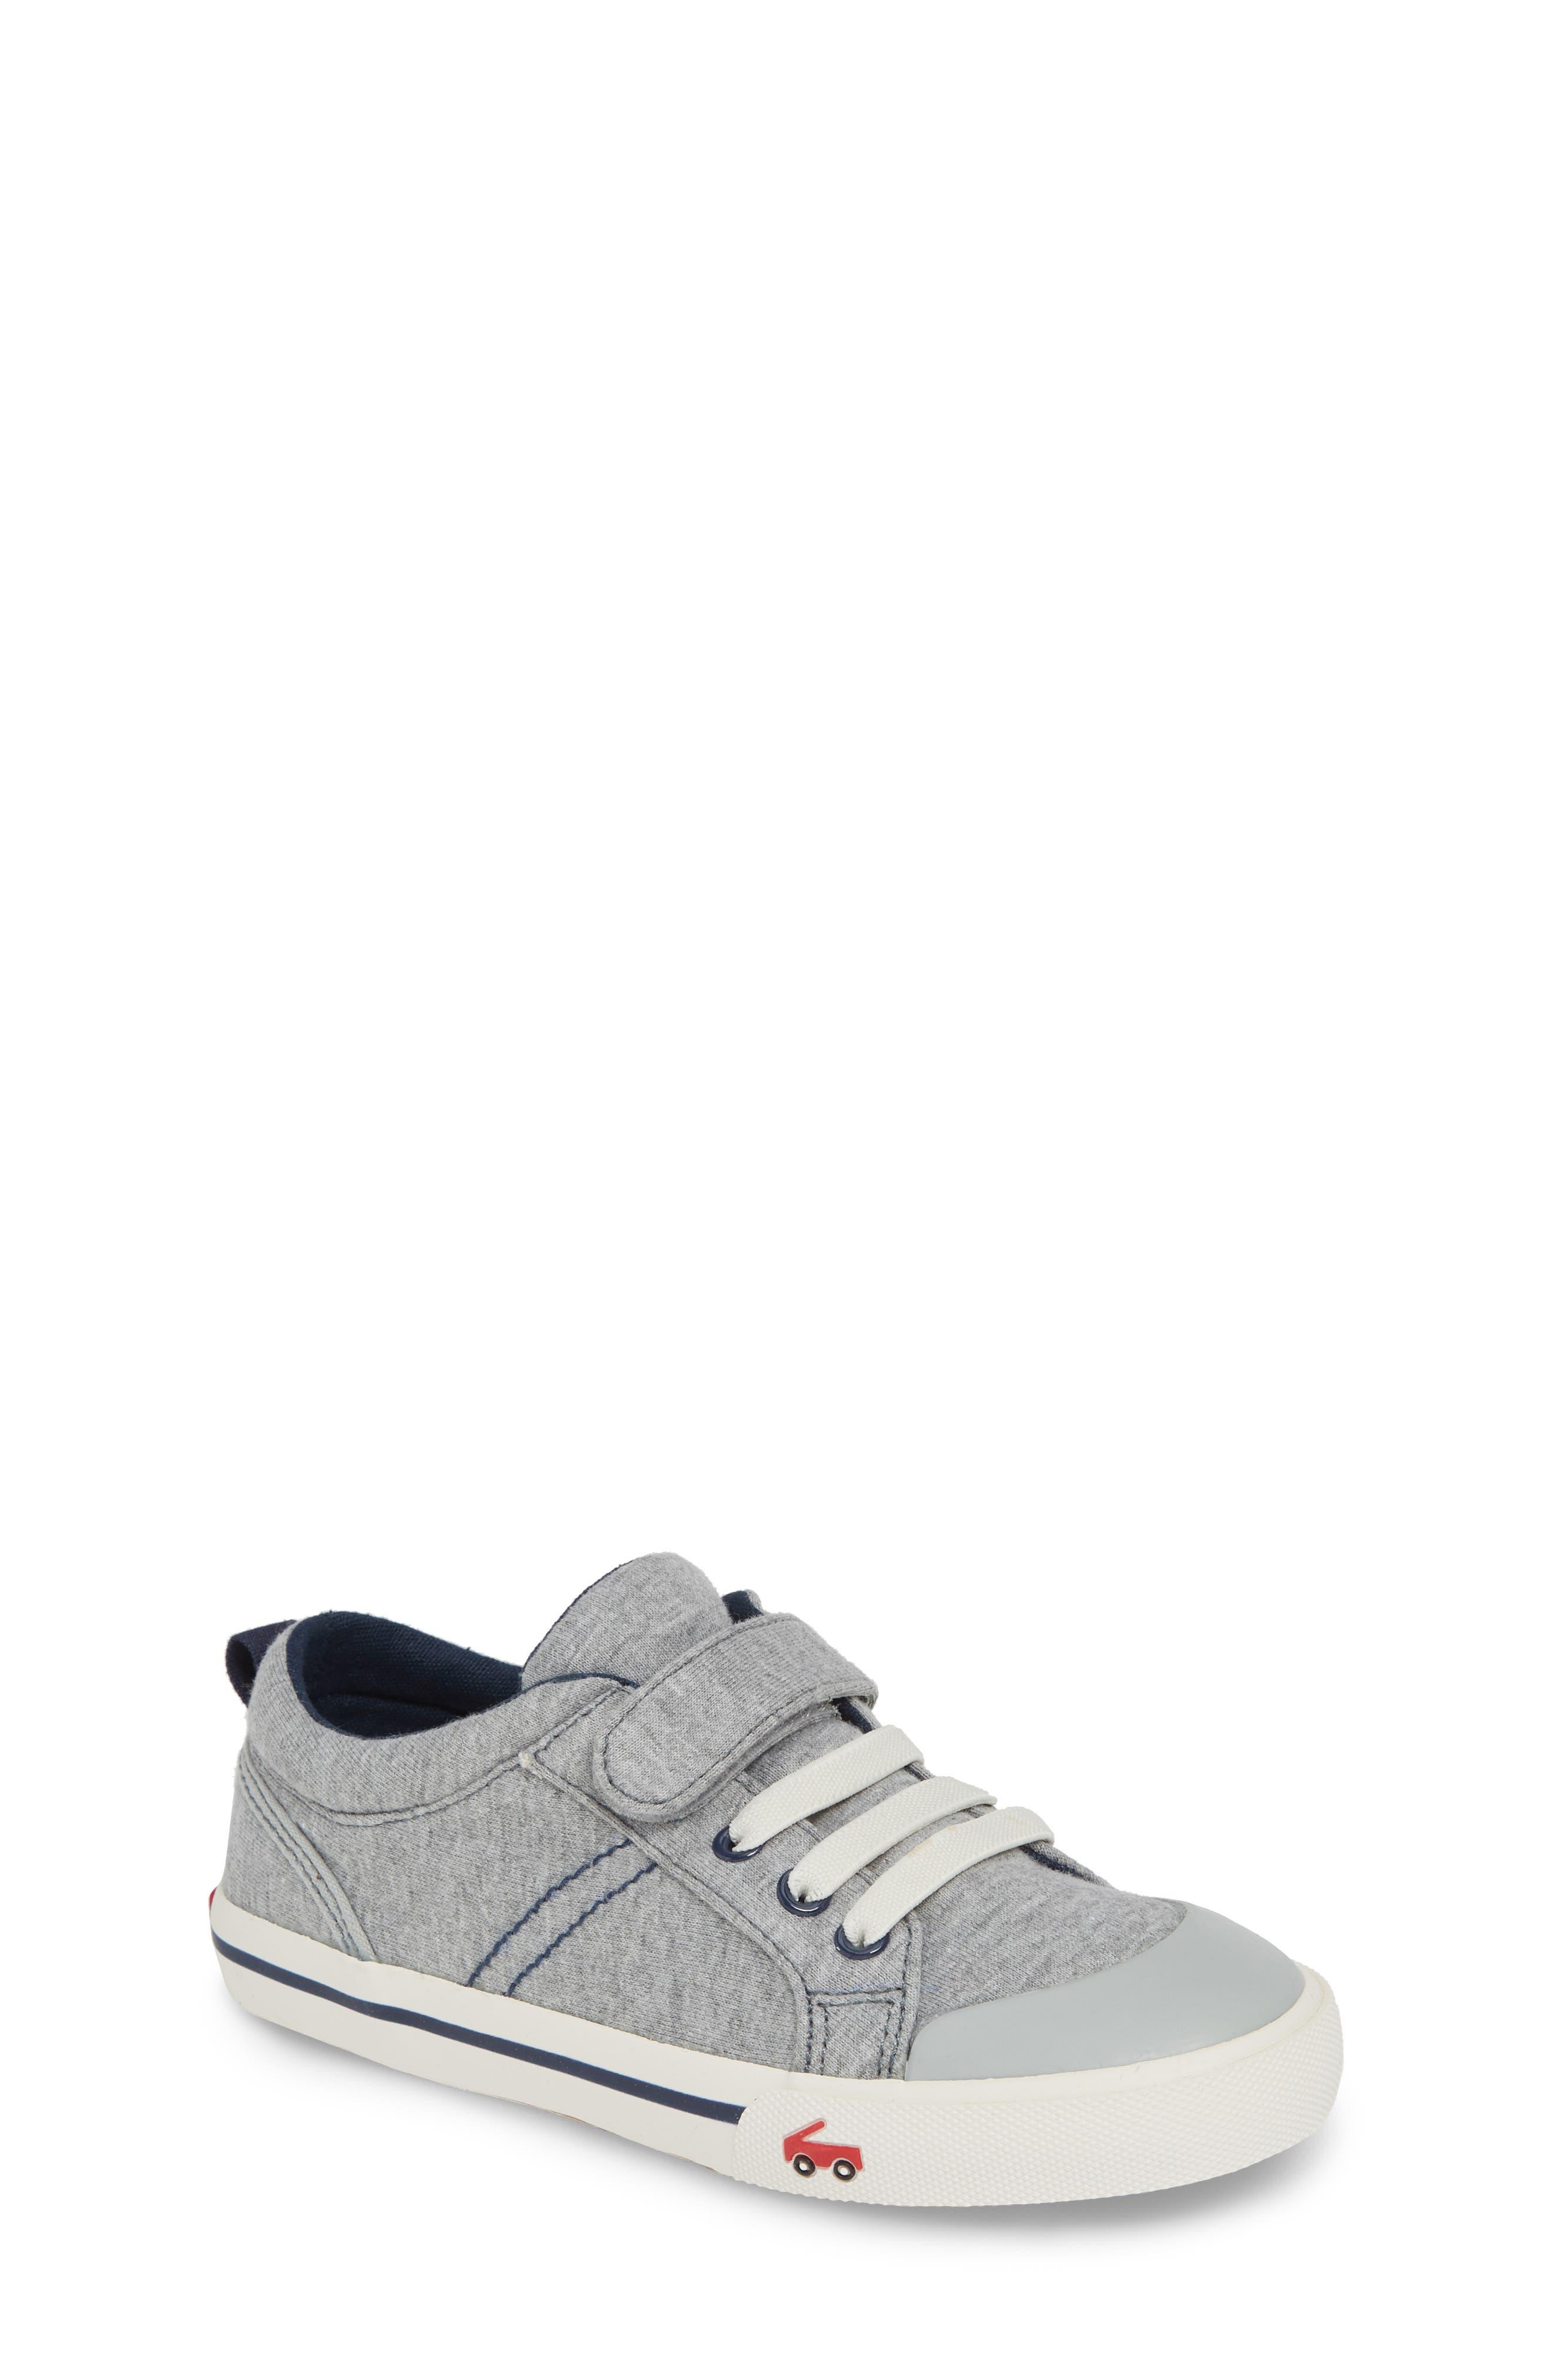 SEE KAI RUN, 'Tanner' Sneaker, Main thumbnail 1, color, GRAY/ BLUE JERSEY